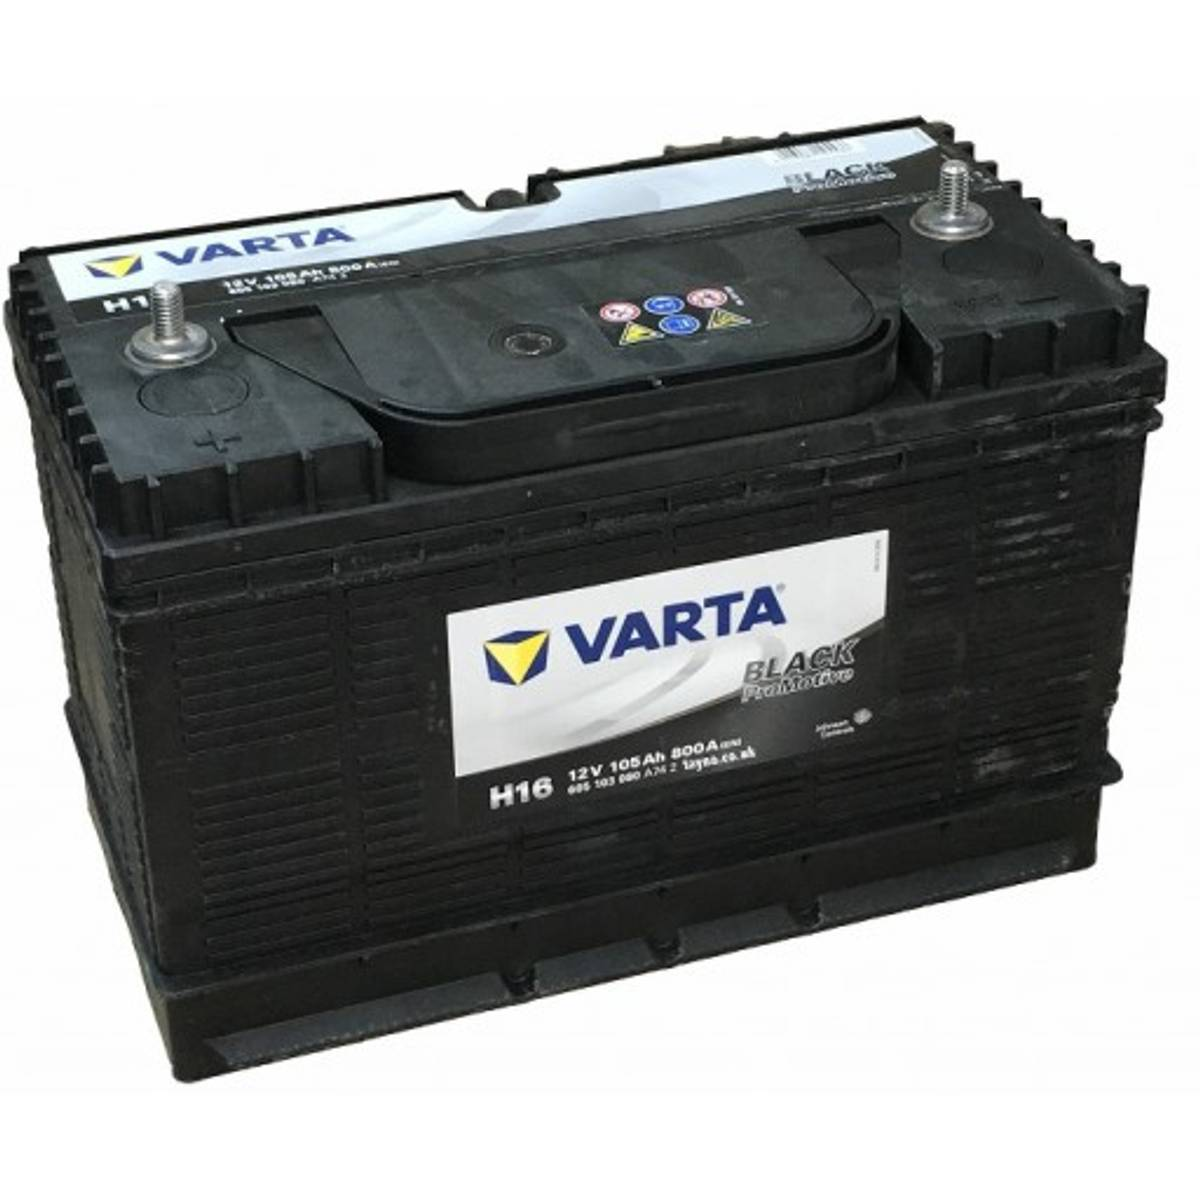 H16 VARTA Promotive HD Batteri 12V 105AH 800CCA (330x172x220/240